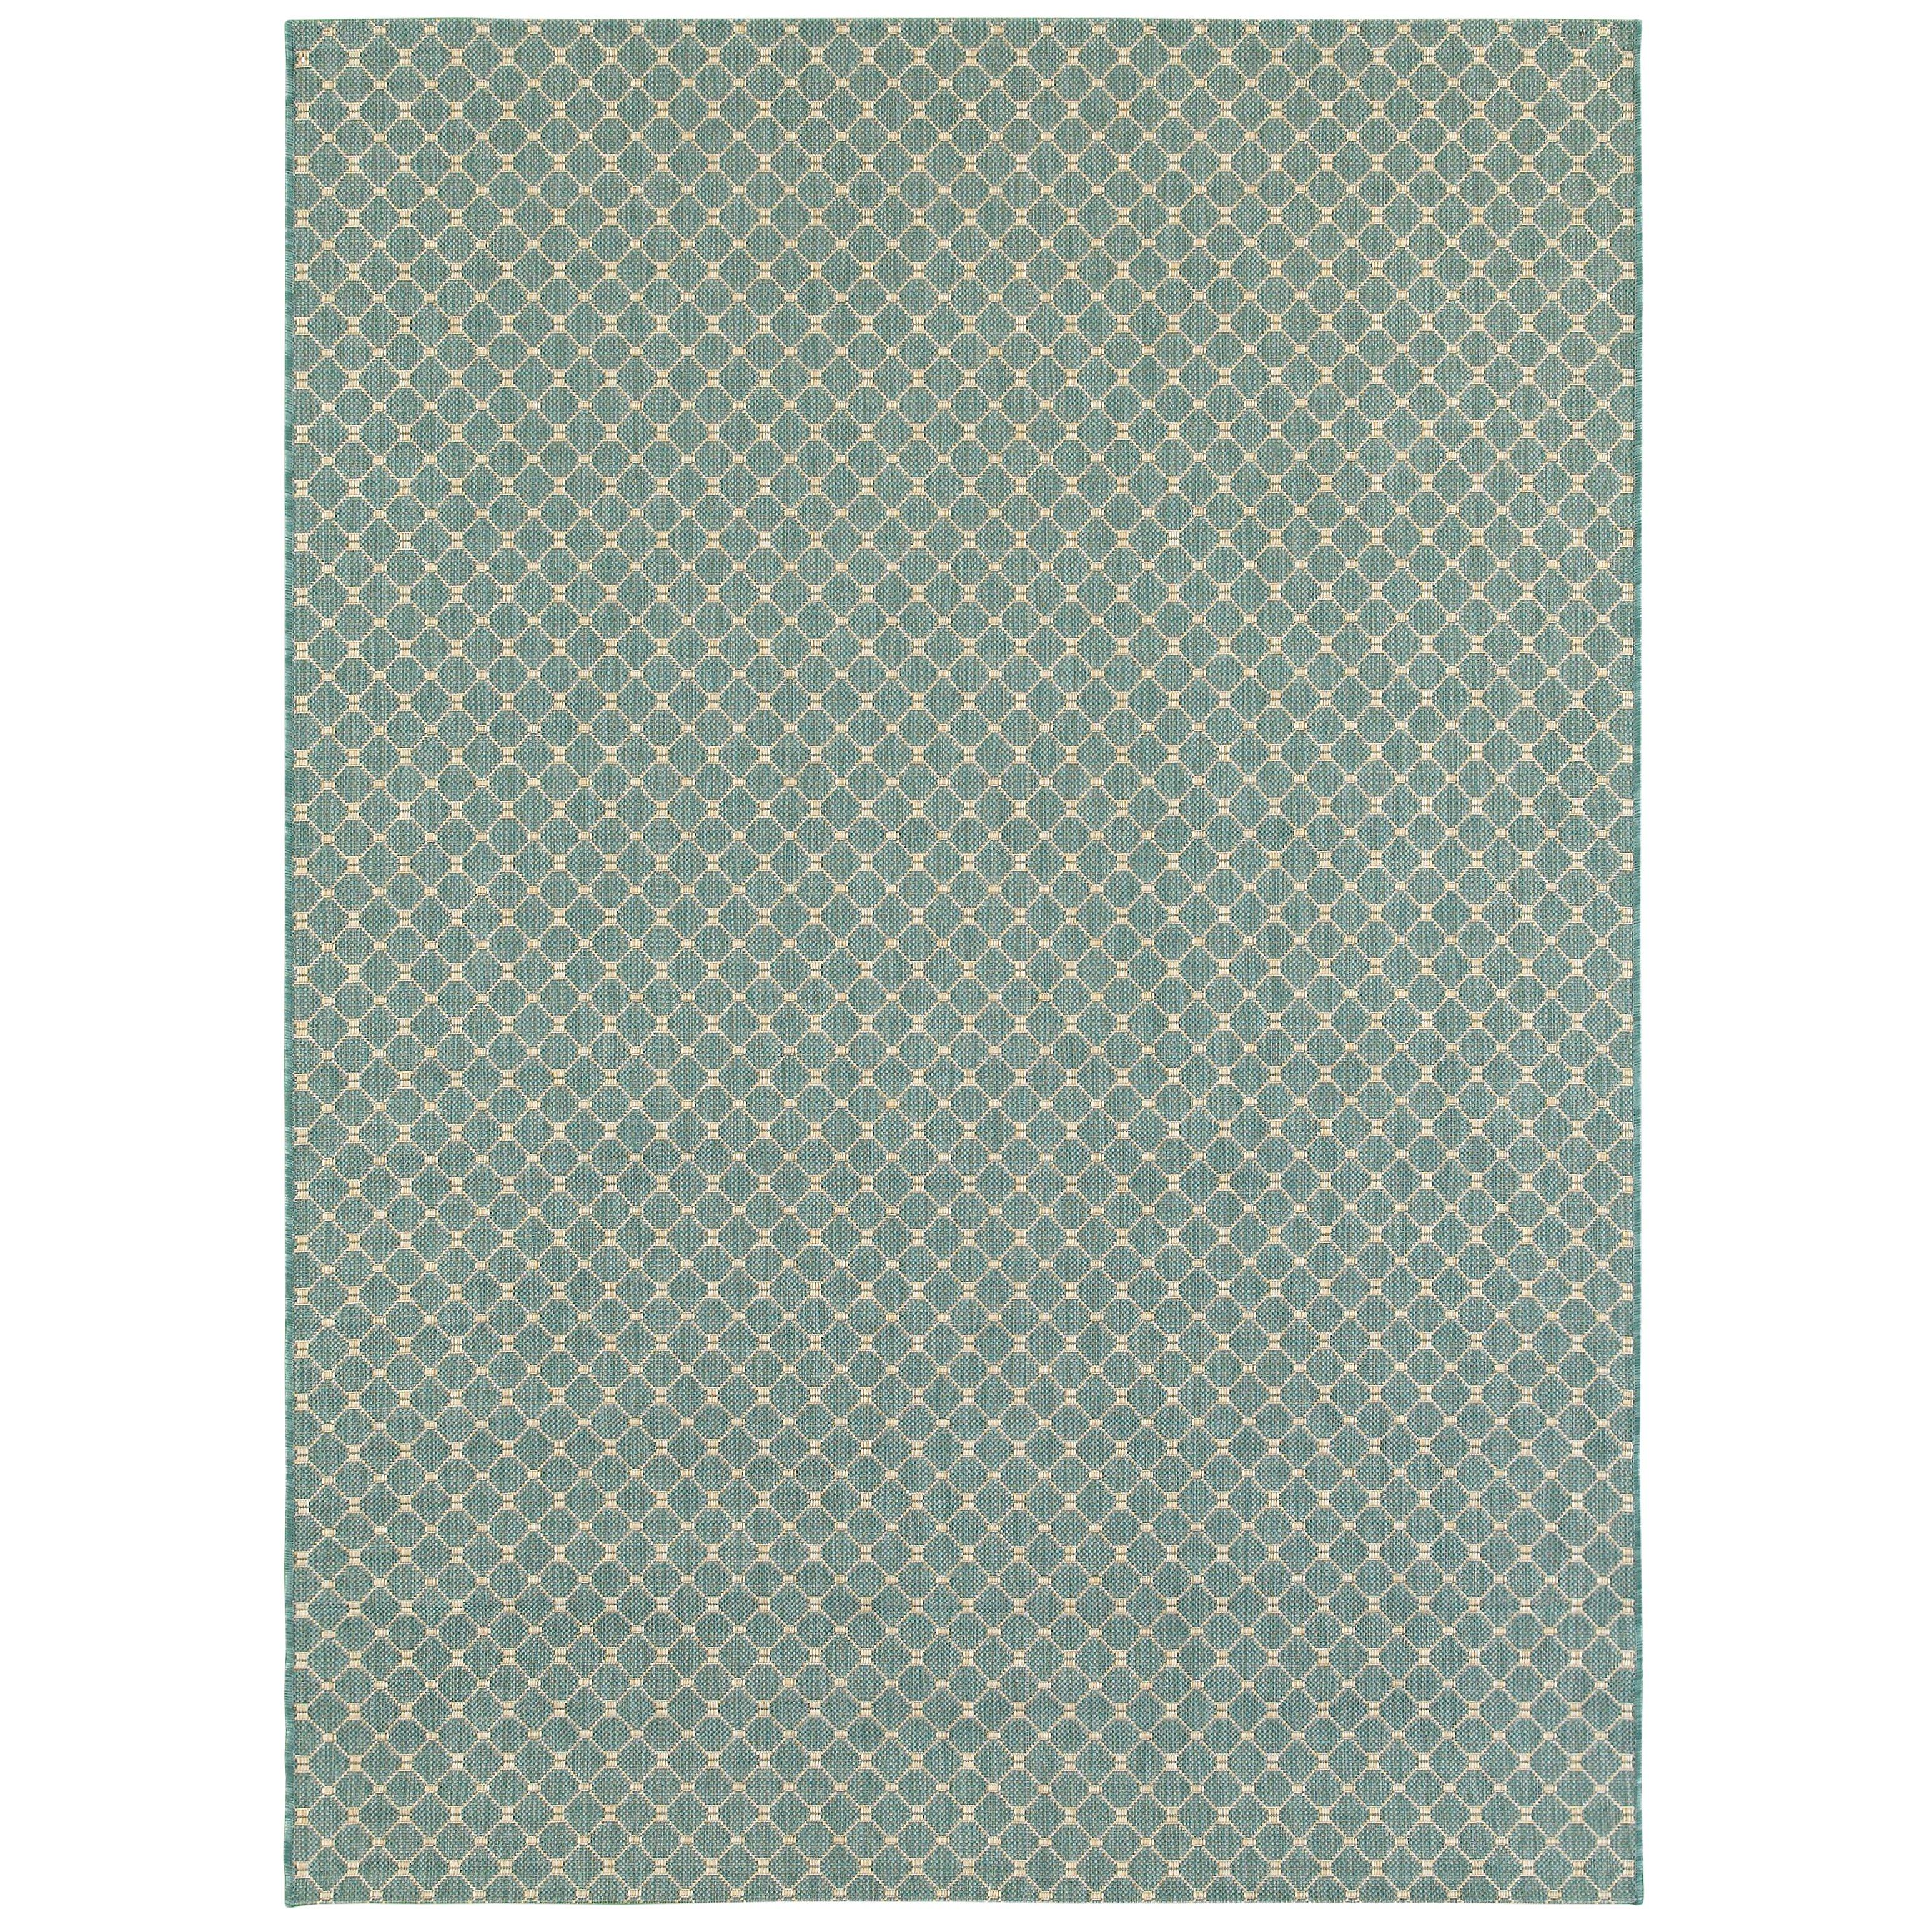 Balta cambridge aquamarine indoor outdoor area rug for Landscape indoor area rug